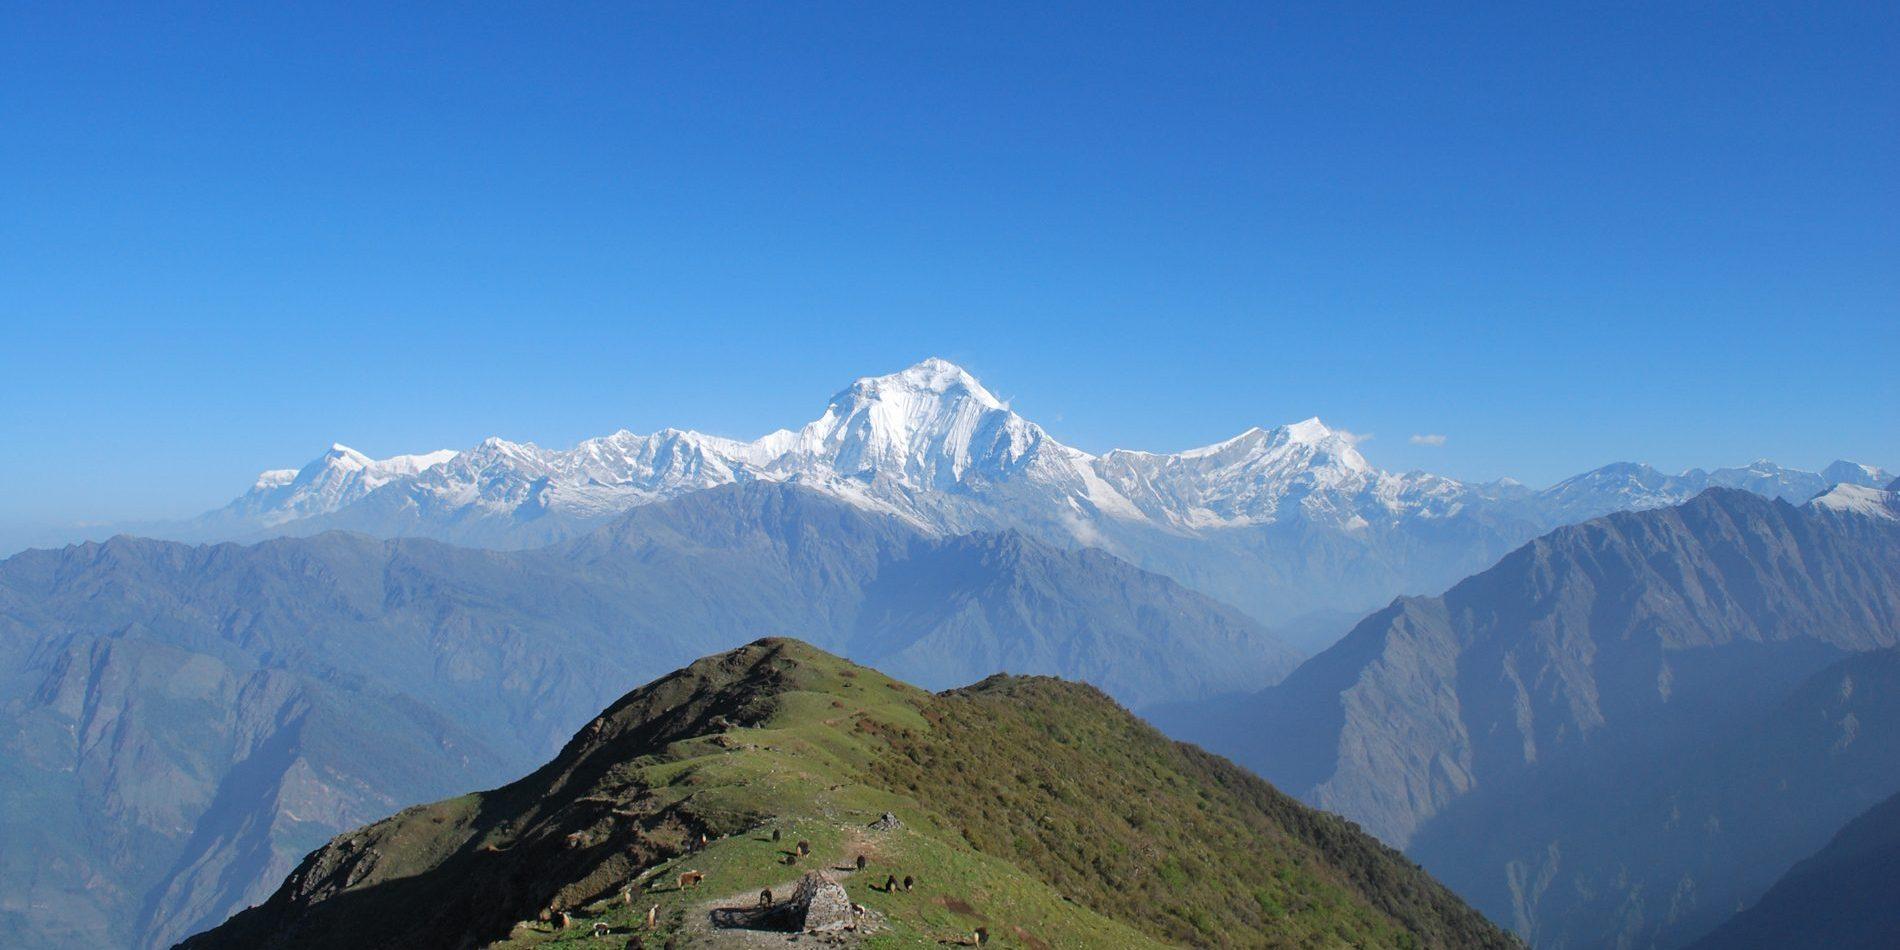 Mt. Dhaulagiri from Khopra Danda